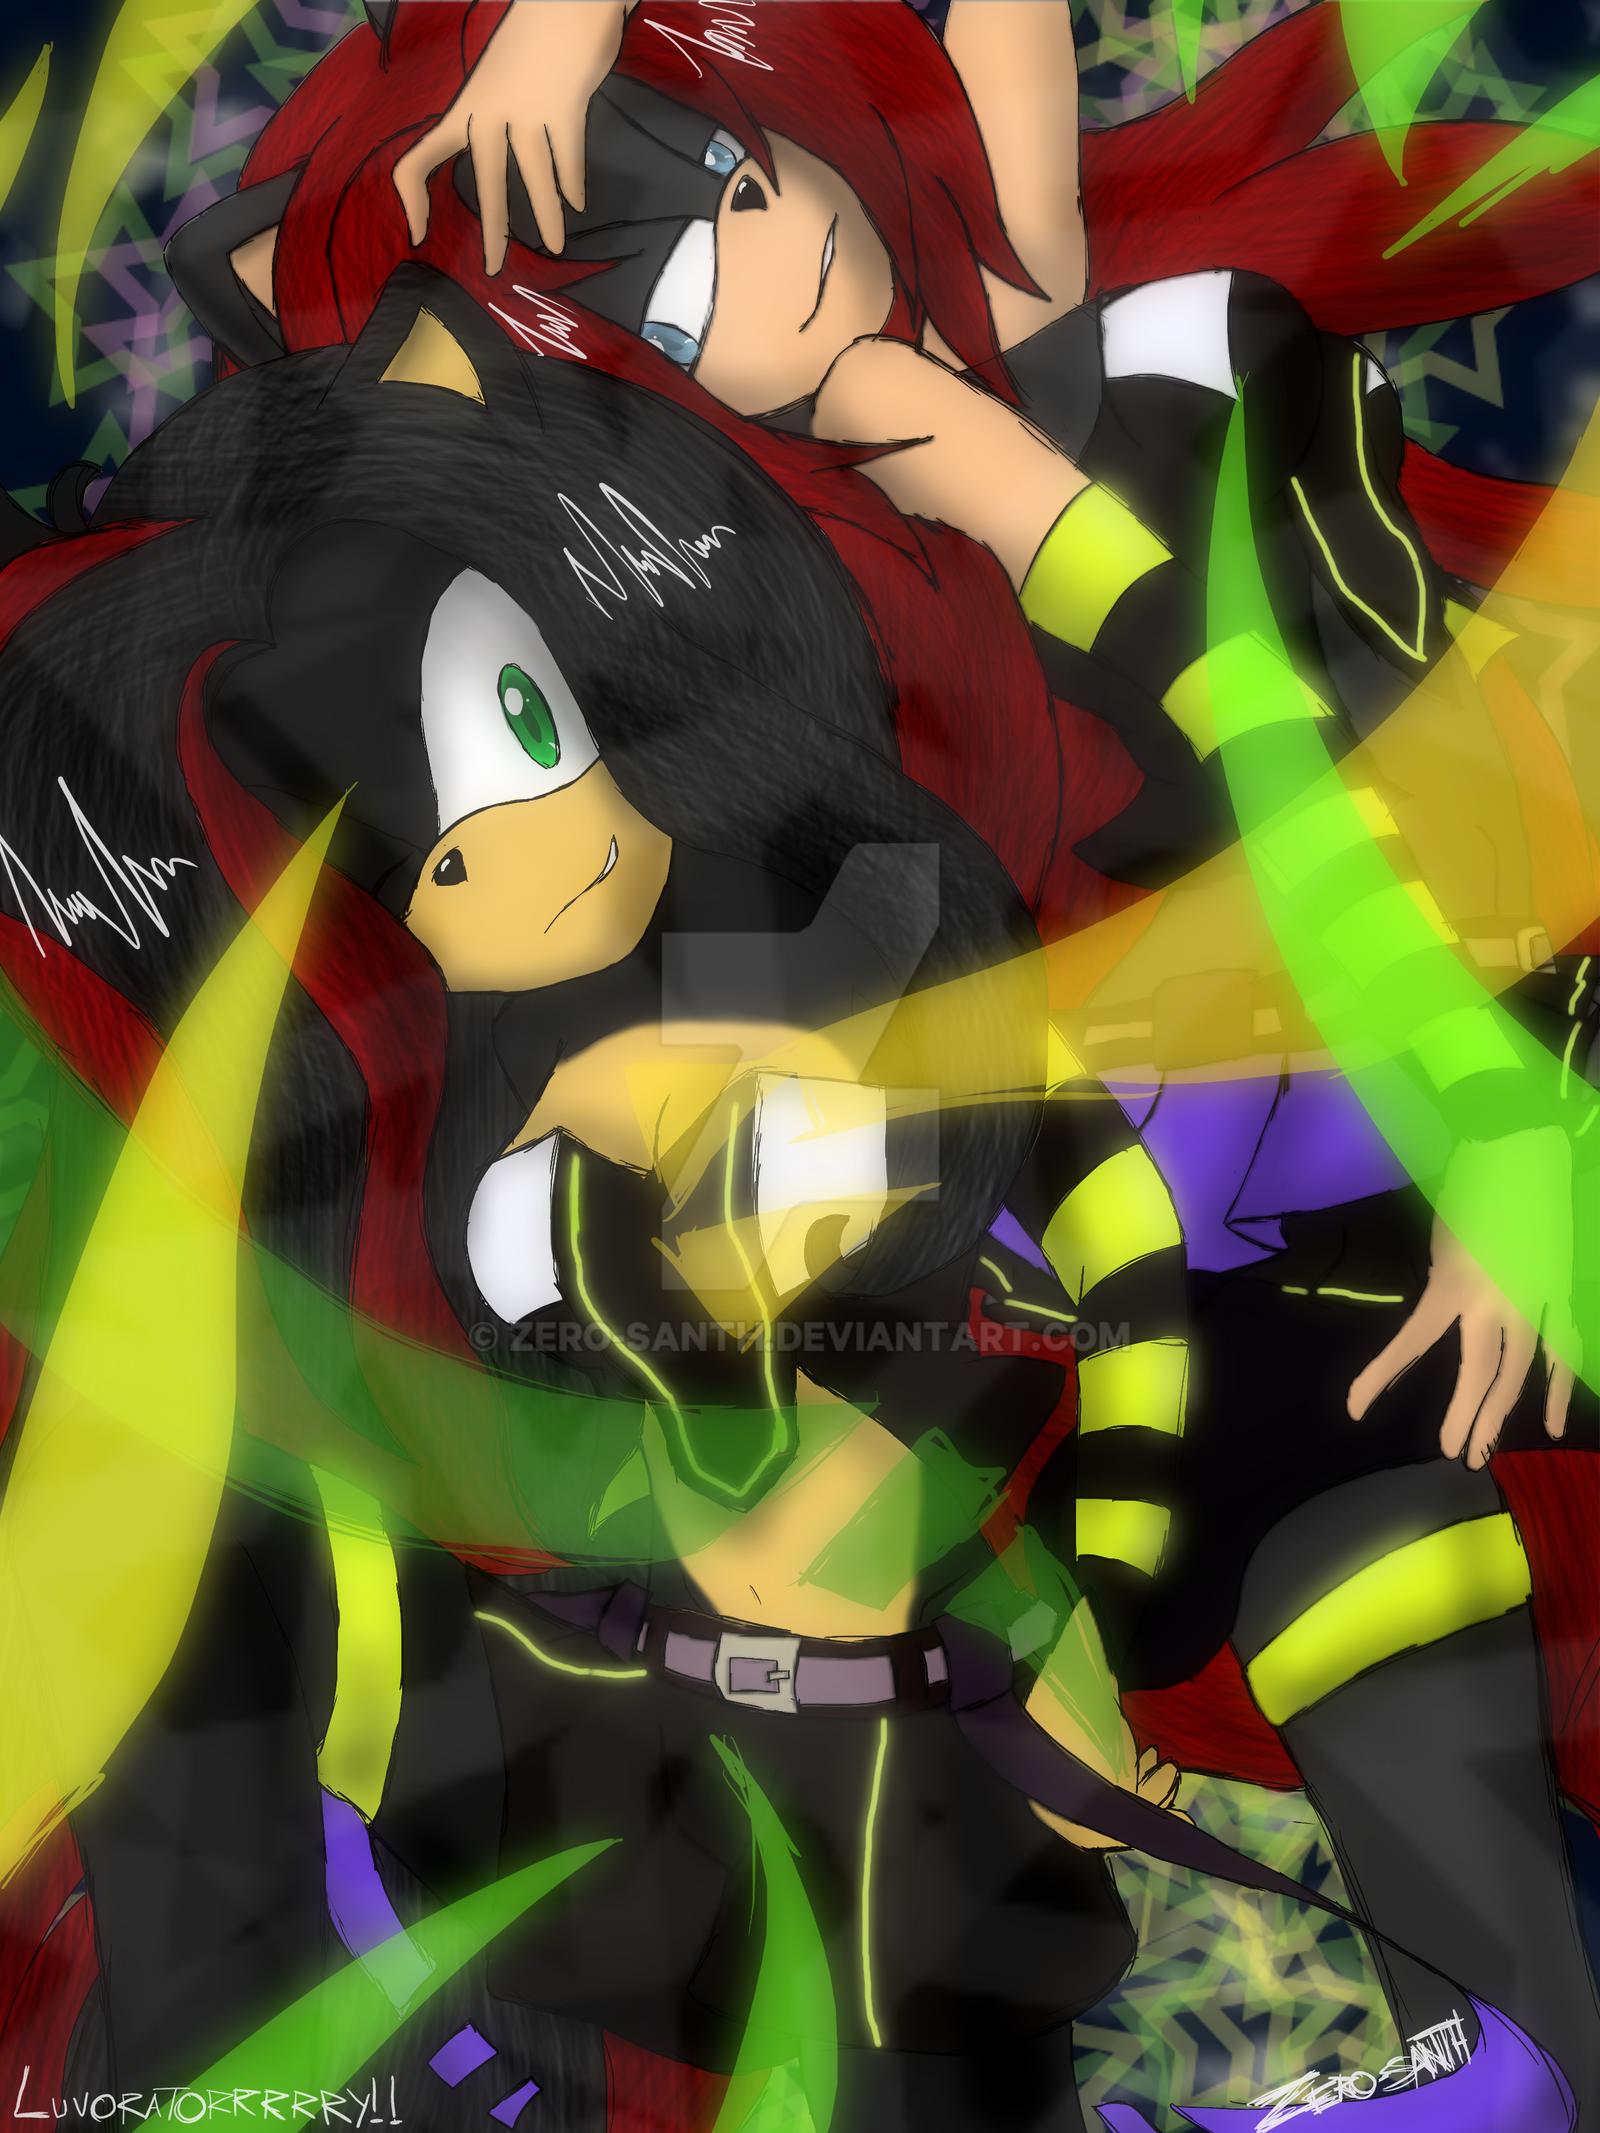 .:Speed Paint:. LUVORATORRRRRY! by Zero-sanTH